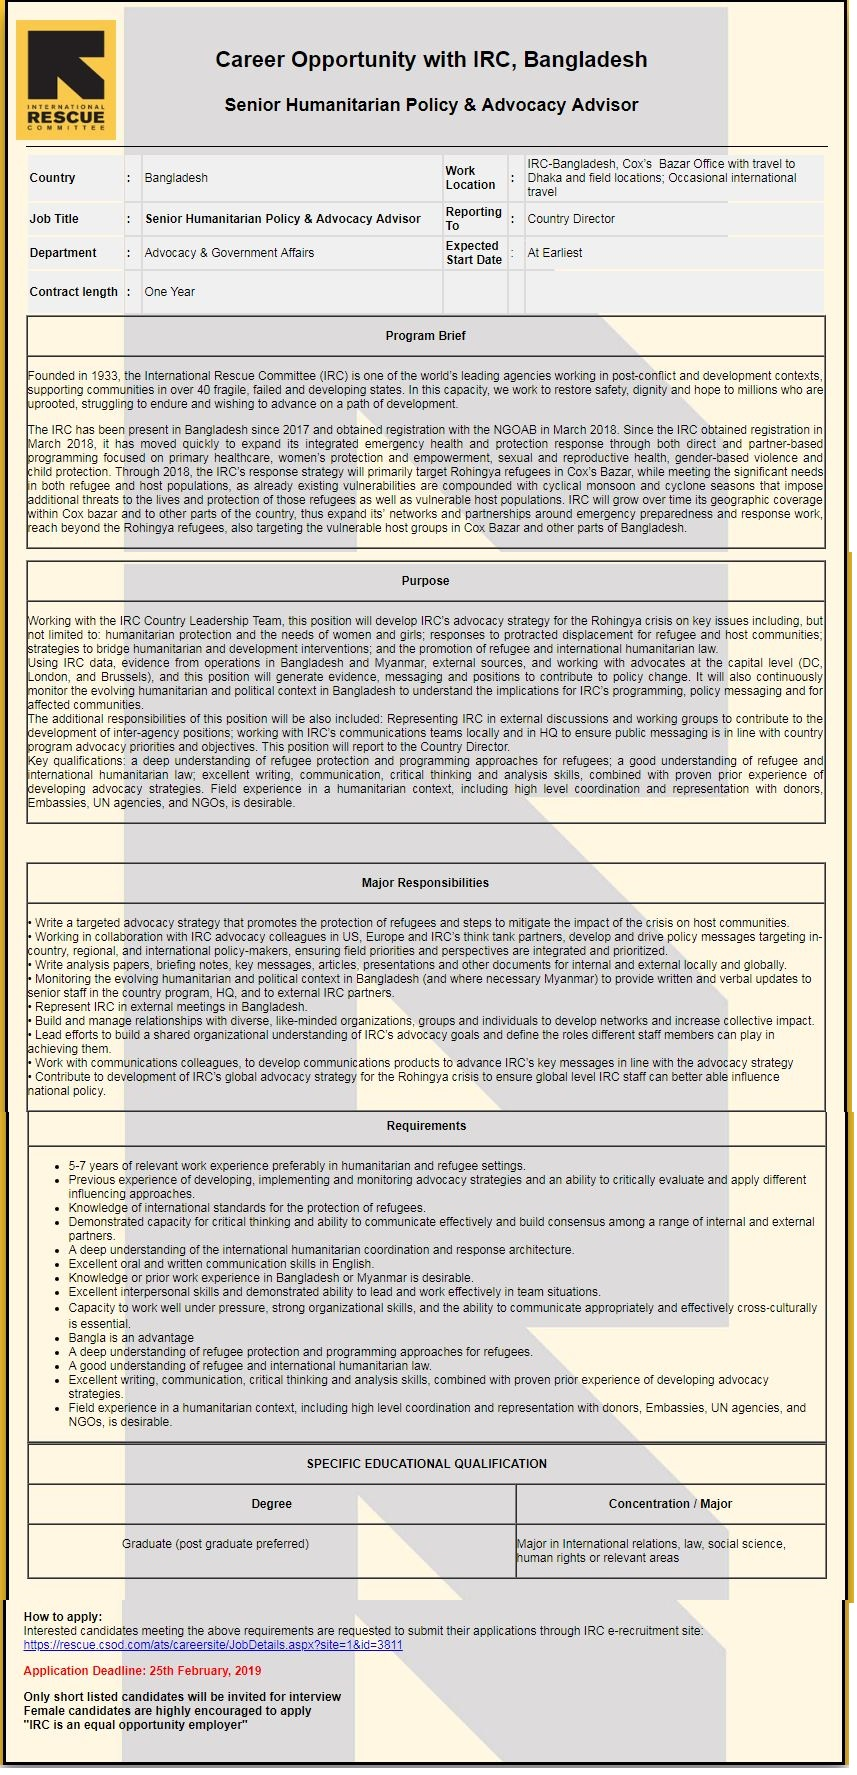 International Rescue Committee job circular 2018